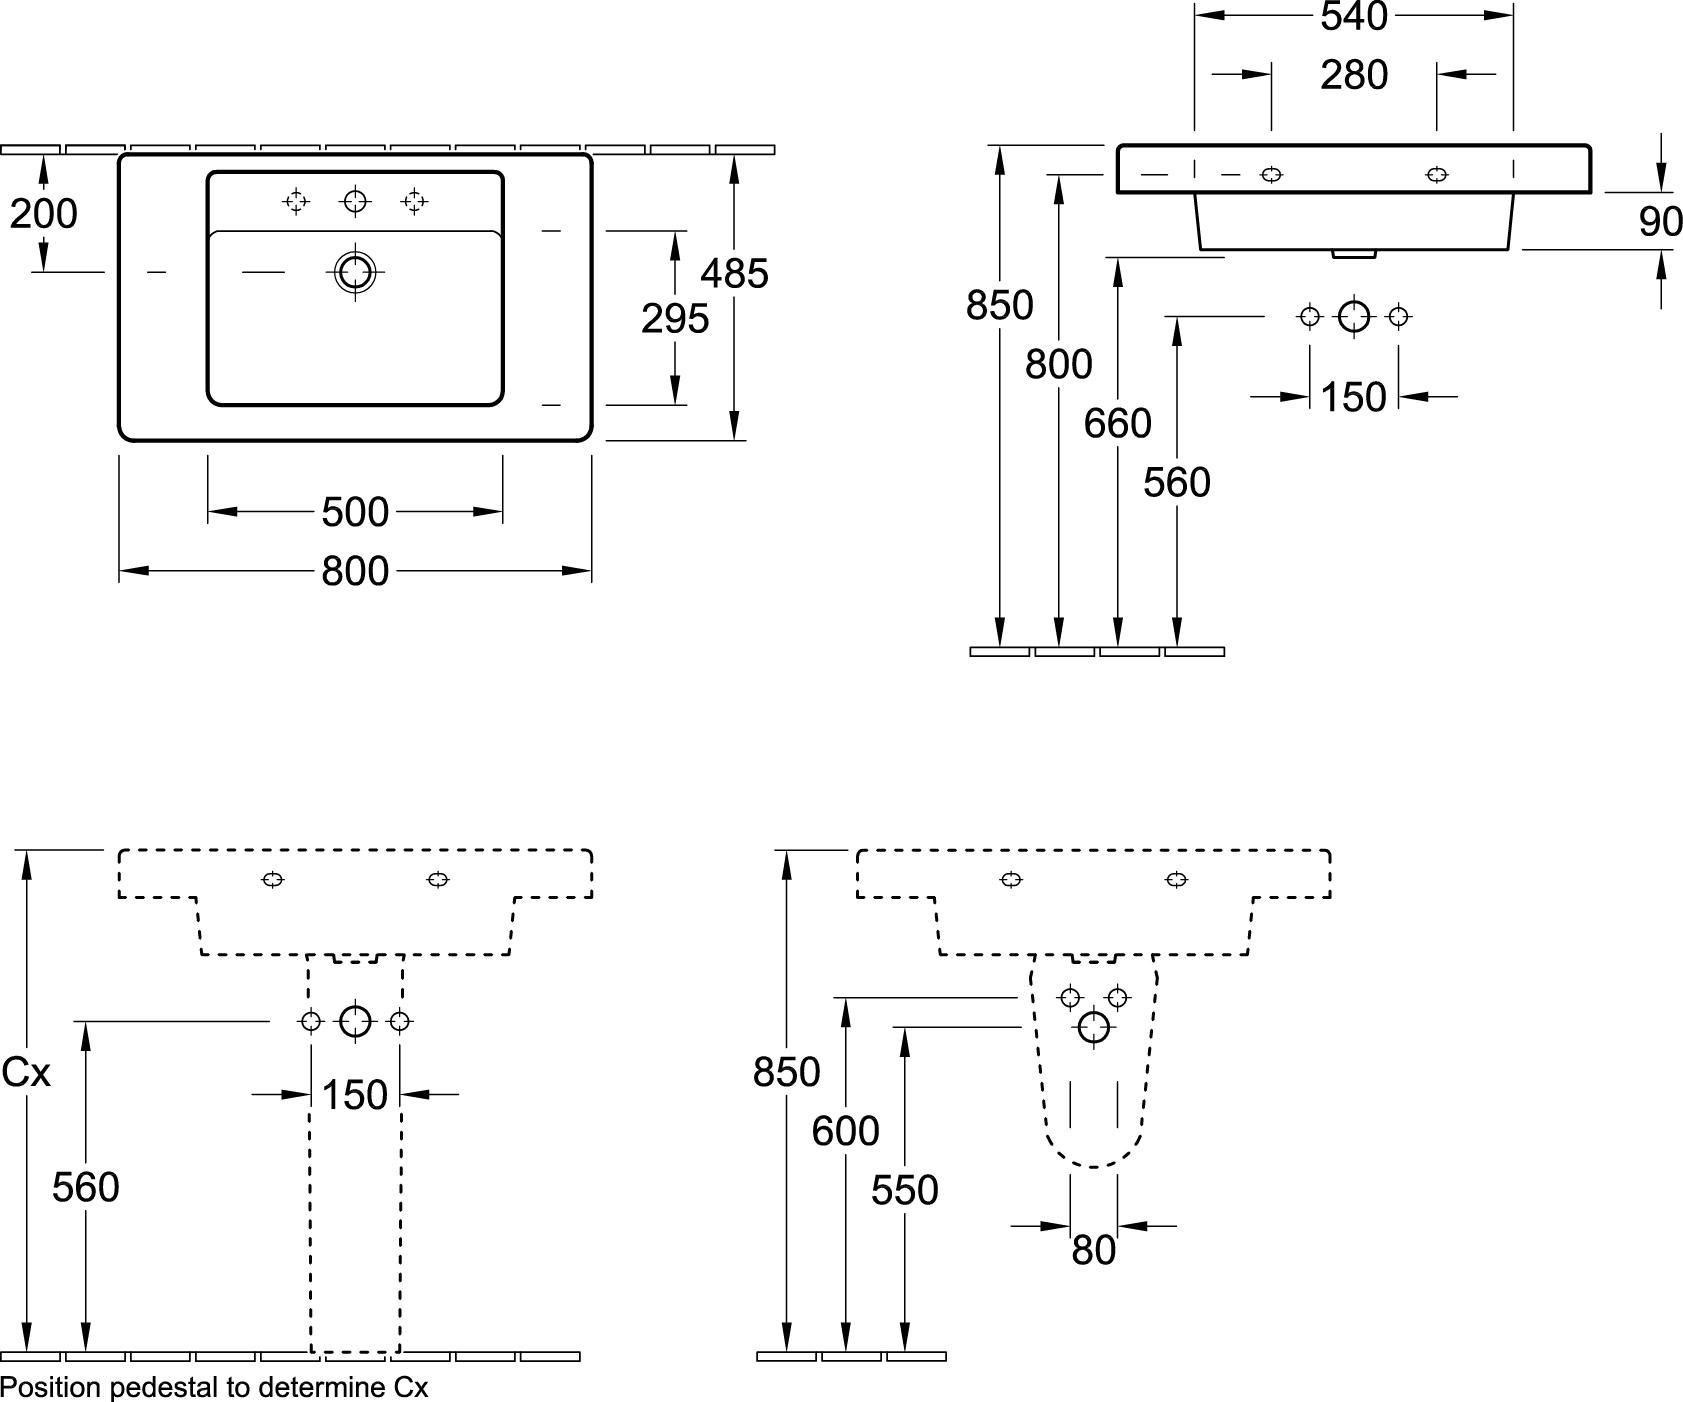 Architectura Single Vanity Basin (800mm)